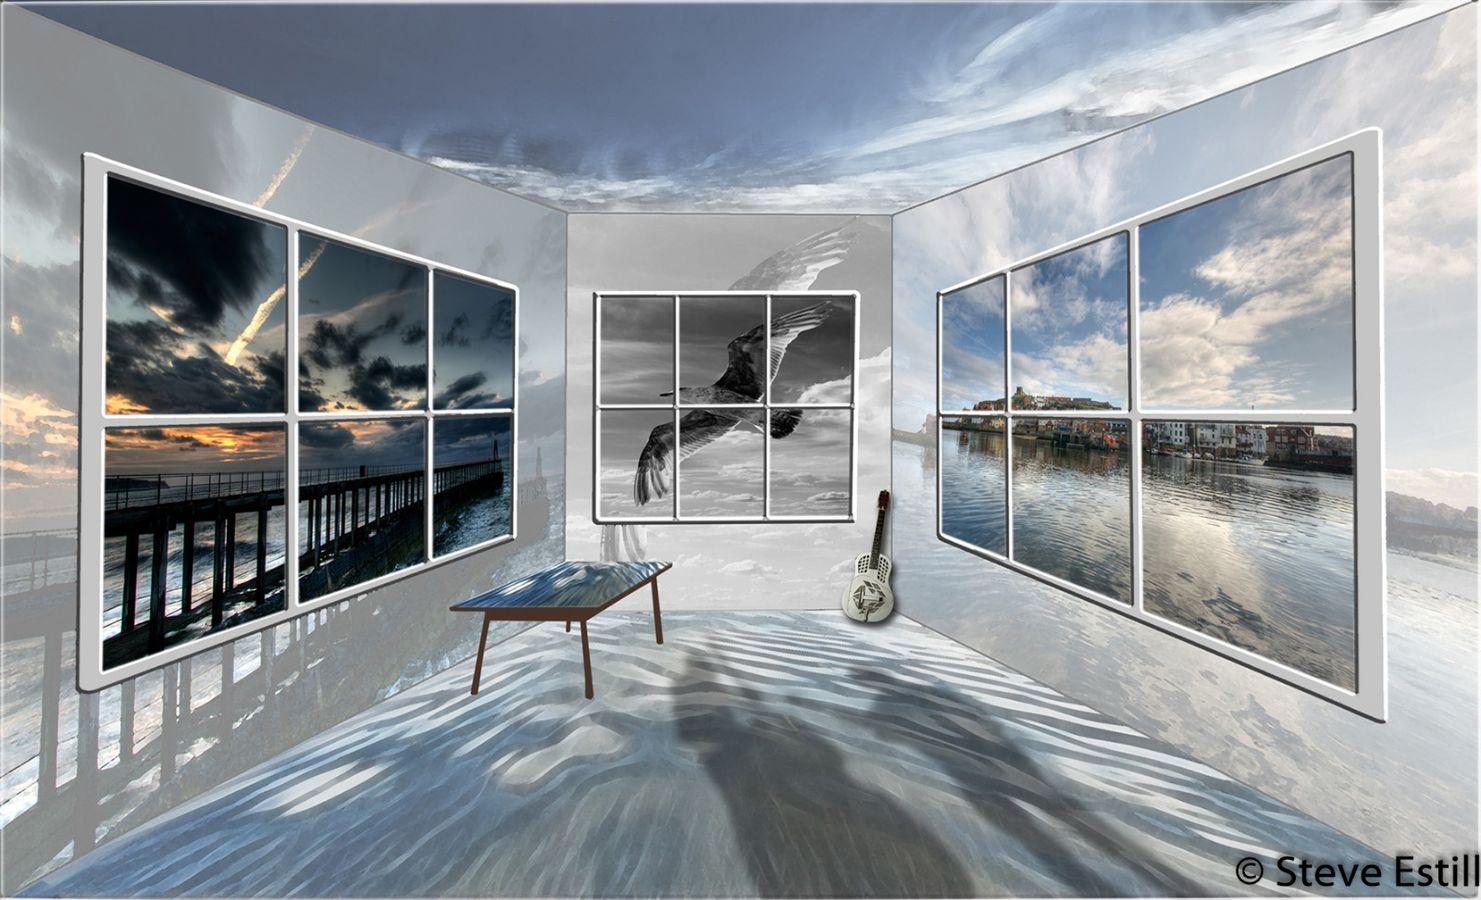 Musicroom in Lightroom